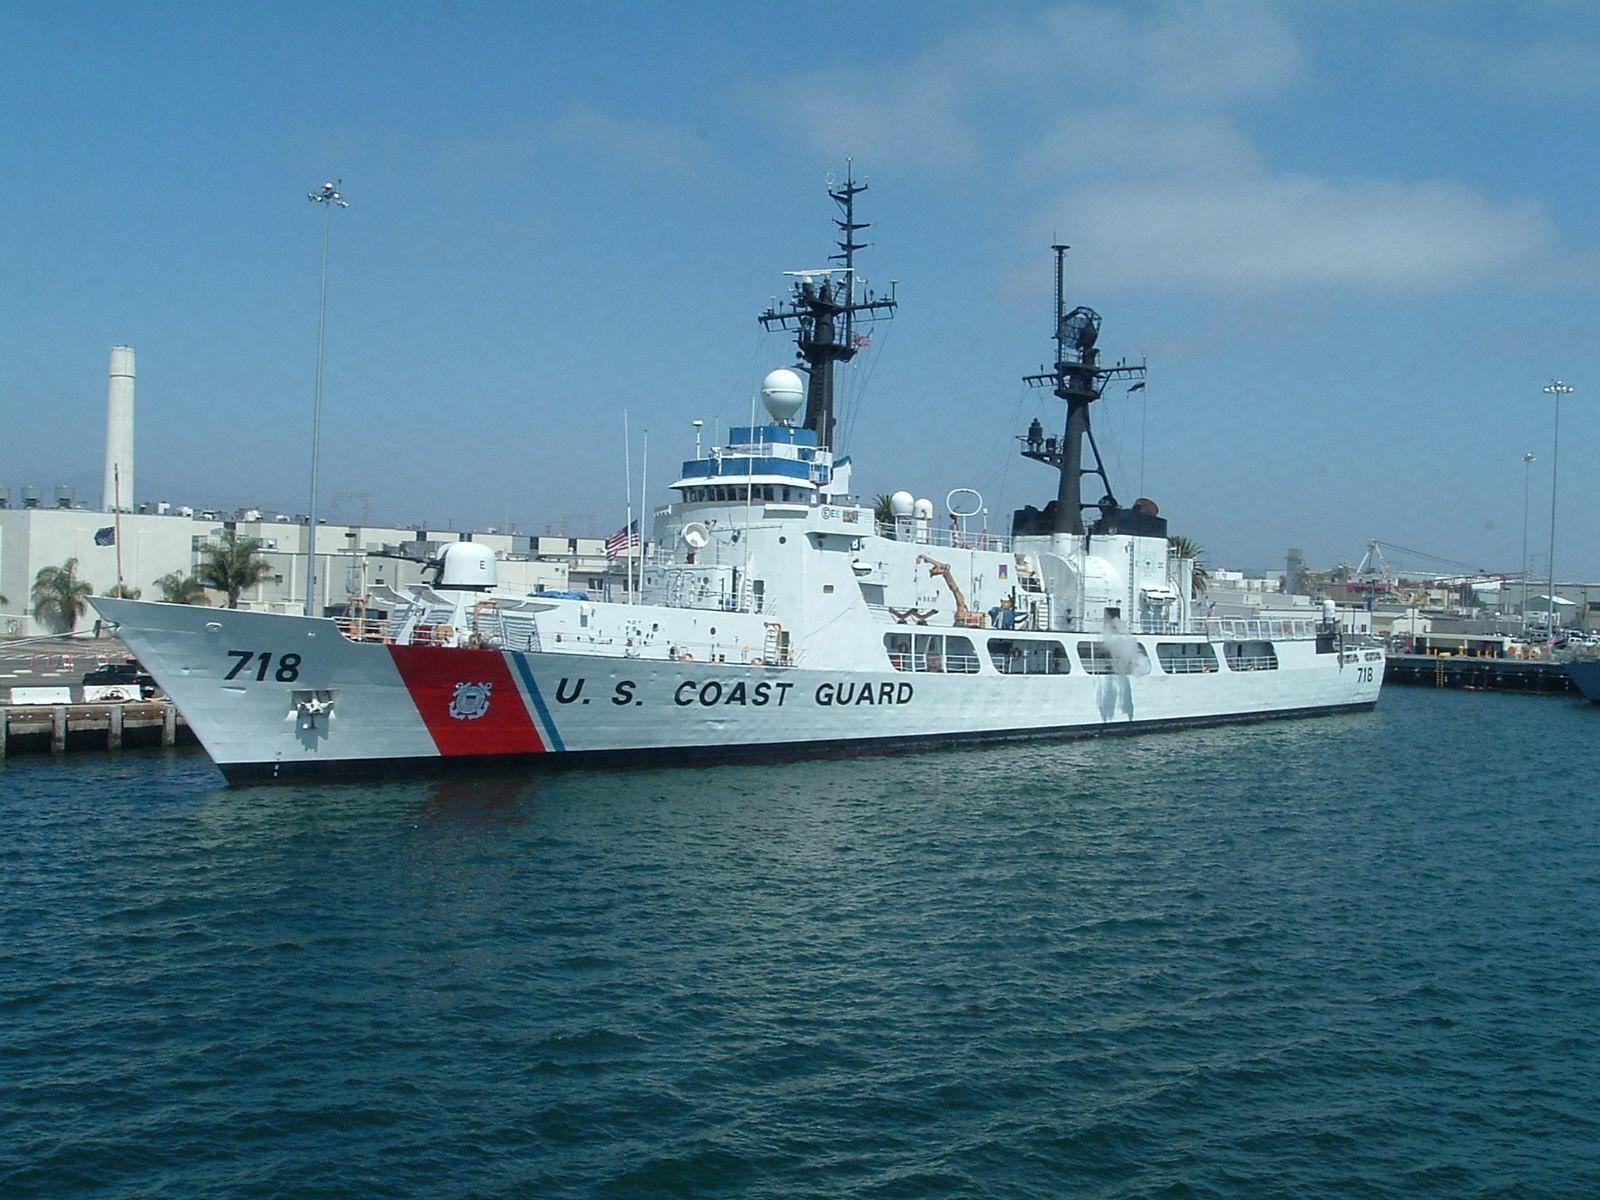 pin by bubba r on uscg pinterest coast guard